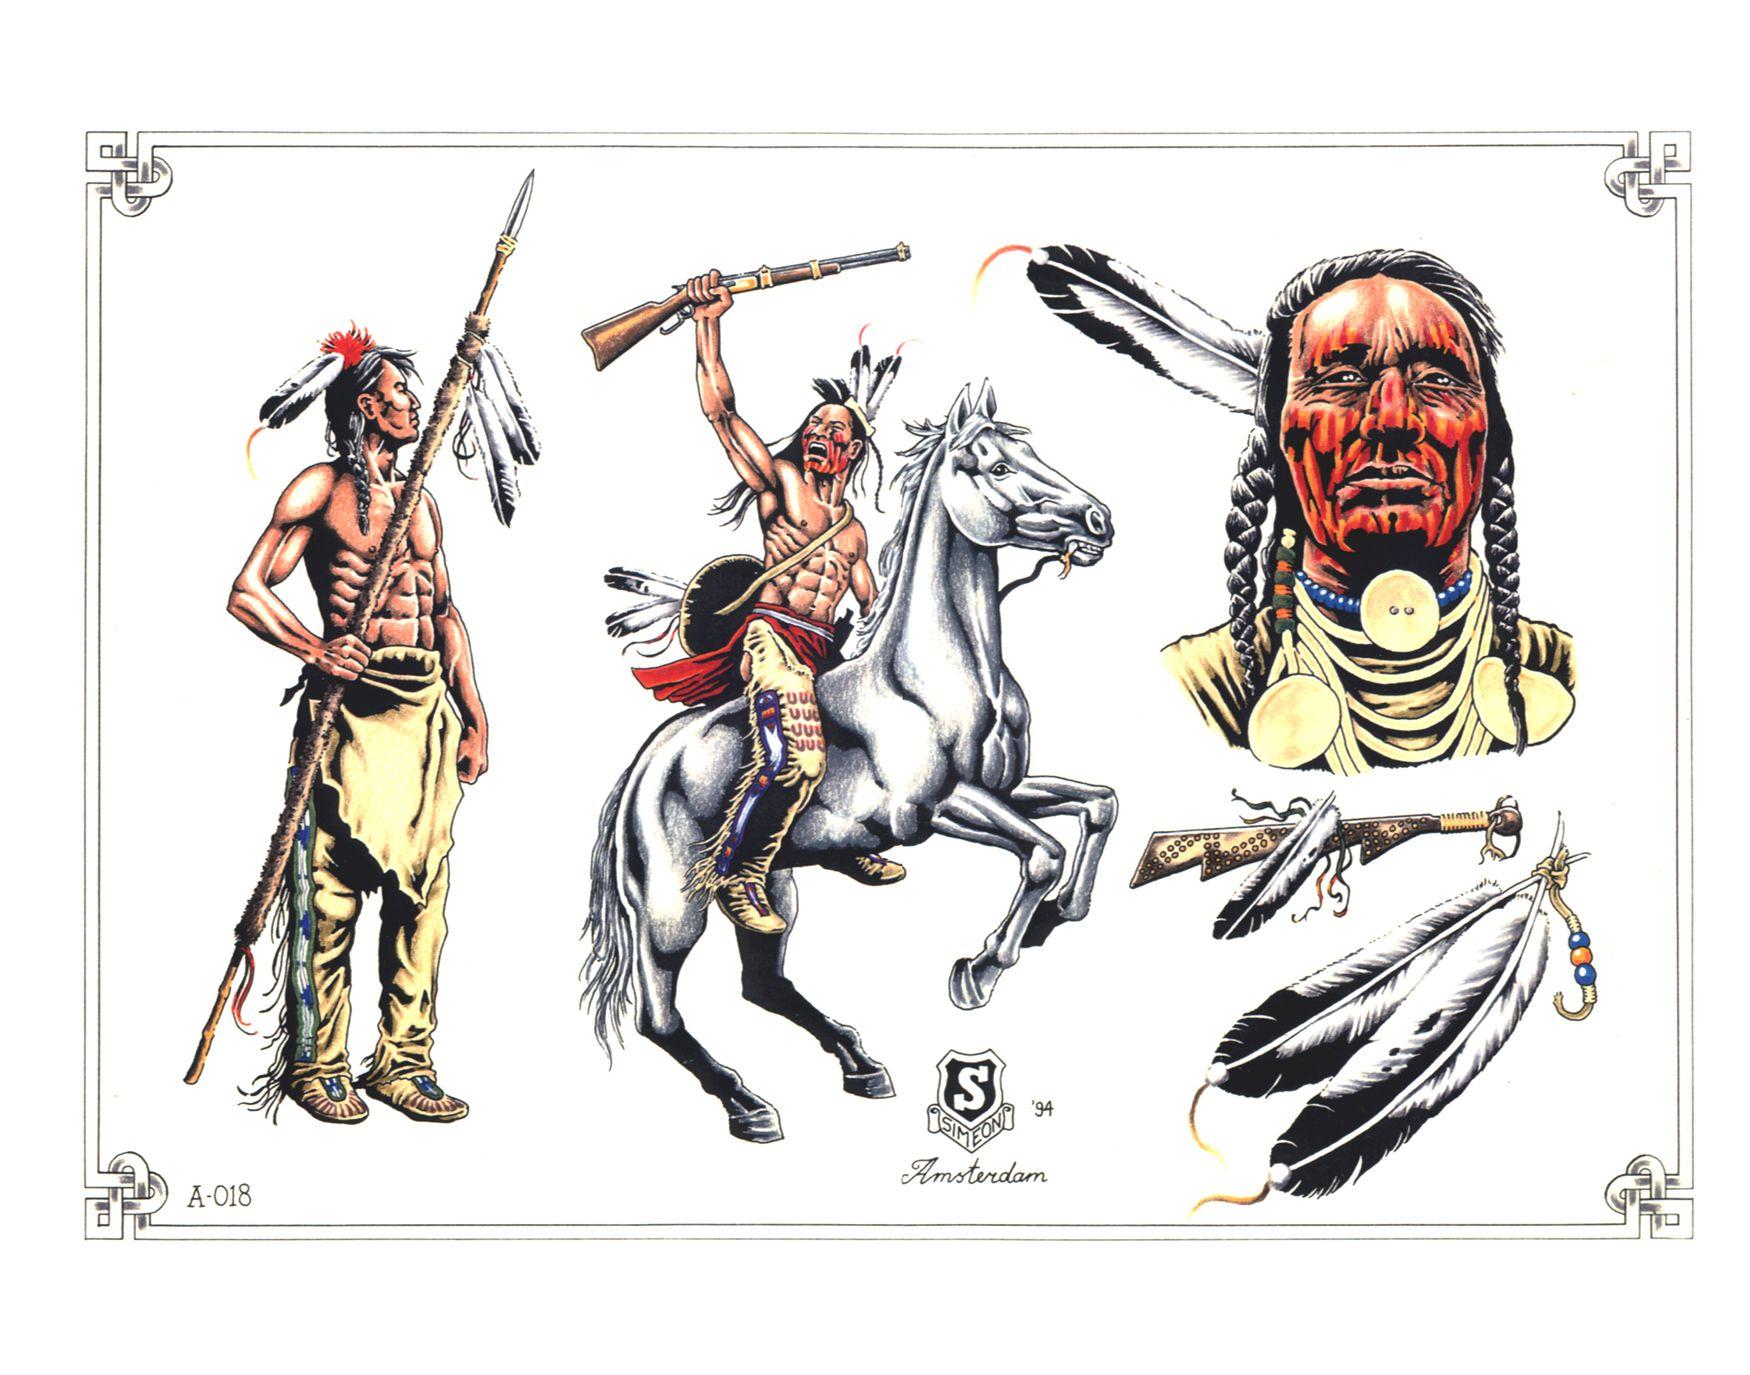 Images for native american warrior symbols native tats images for native american warrior symbols buycottarizona Images